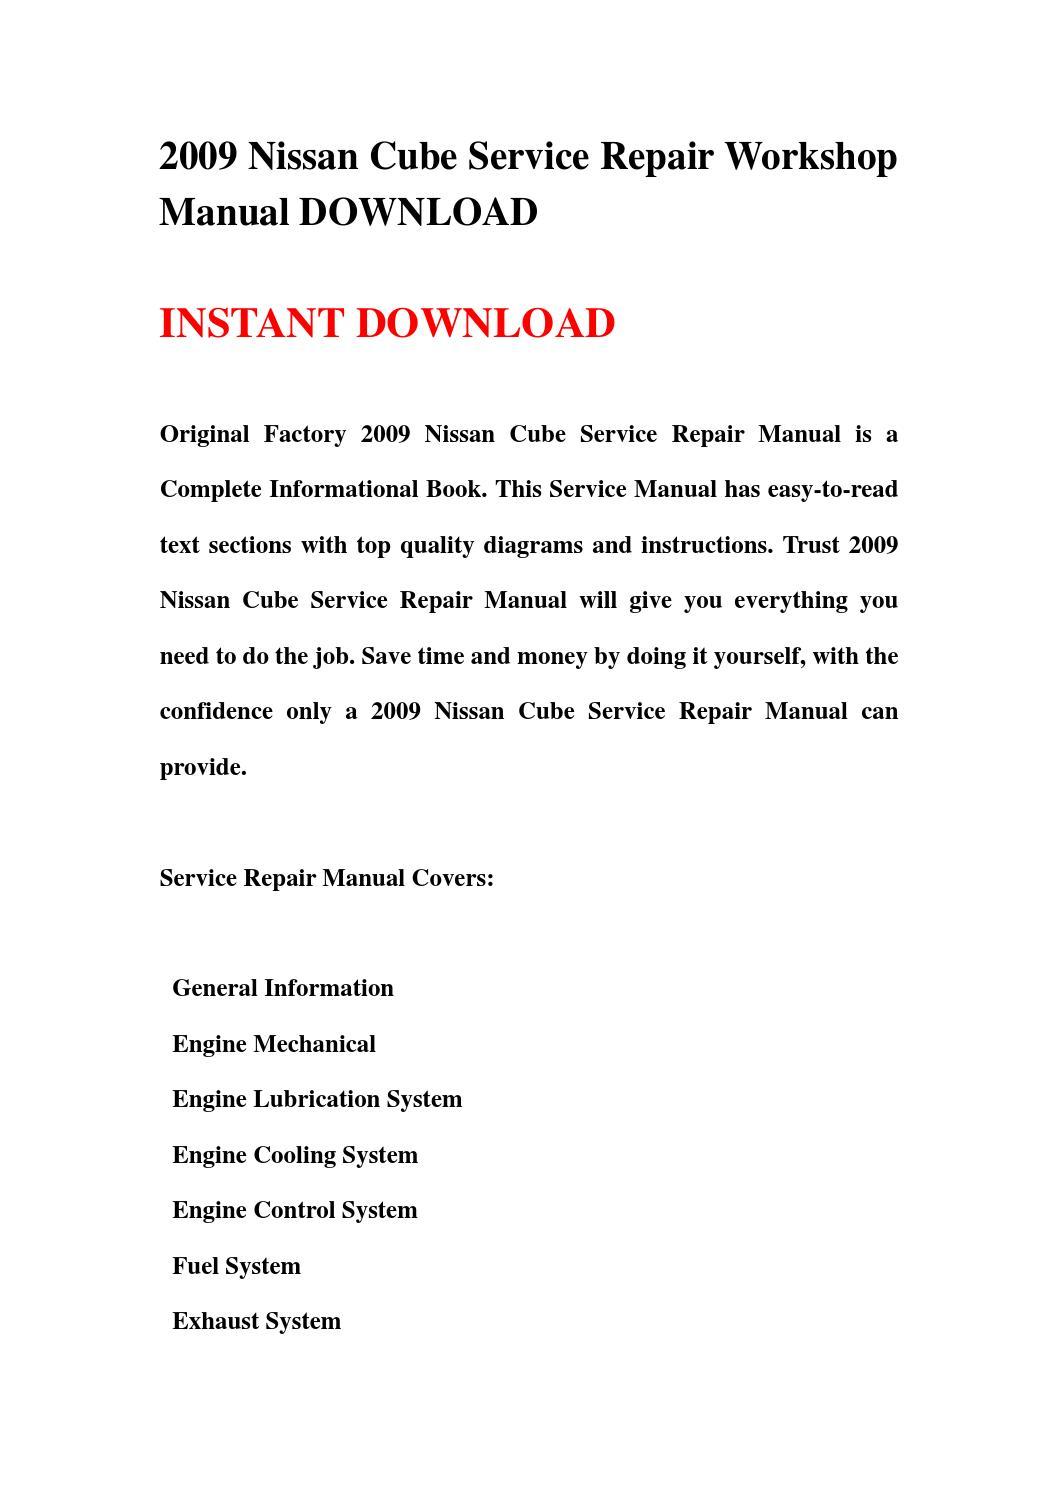 2009 Nissan Cube Service Repair Workshop Manual Download By Engine Diagram Jnhmsefnn Issuu